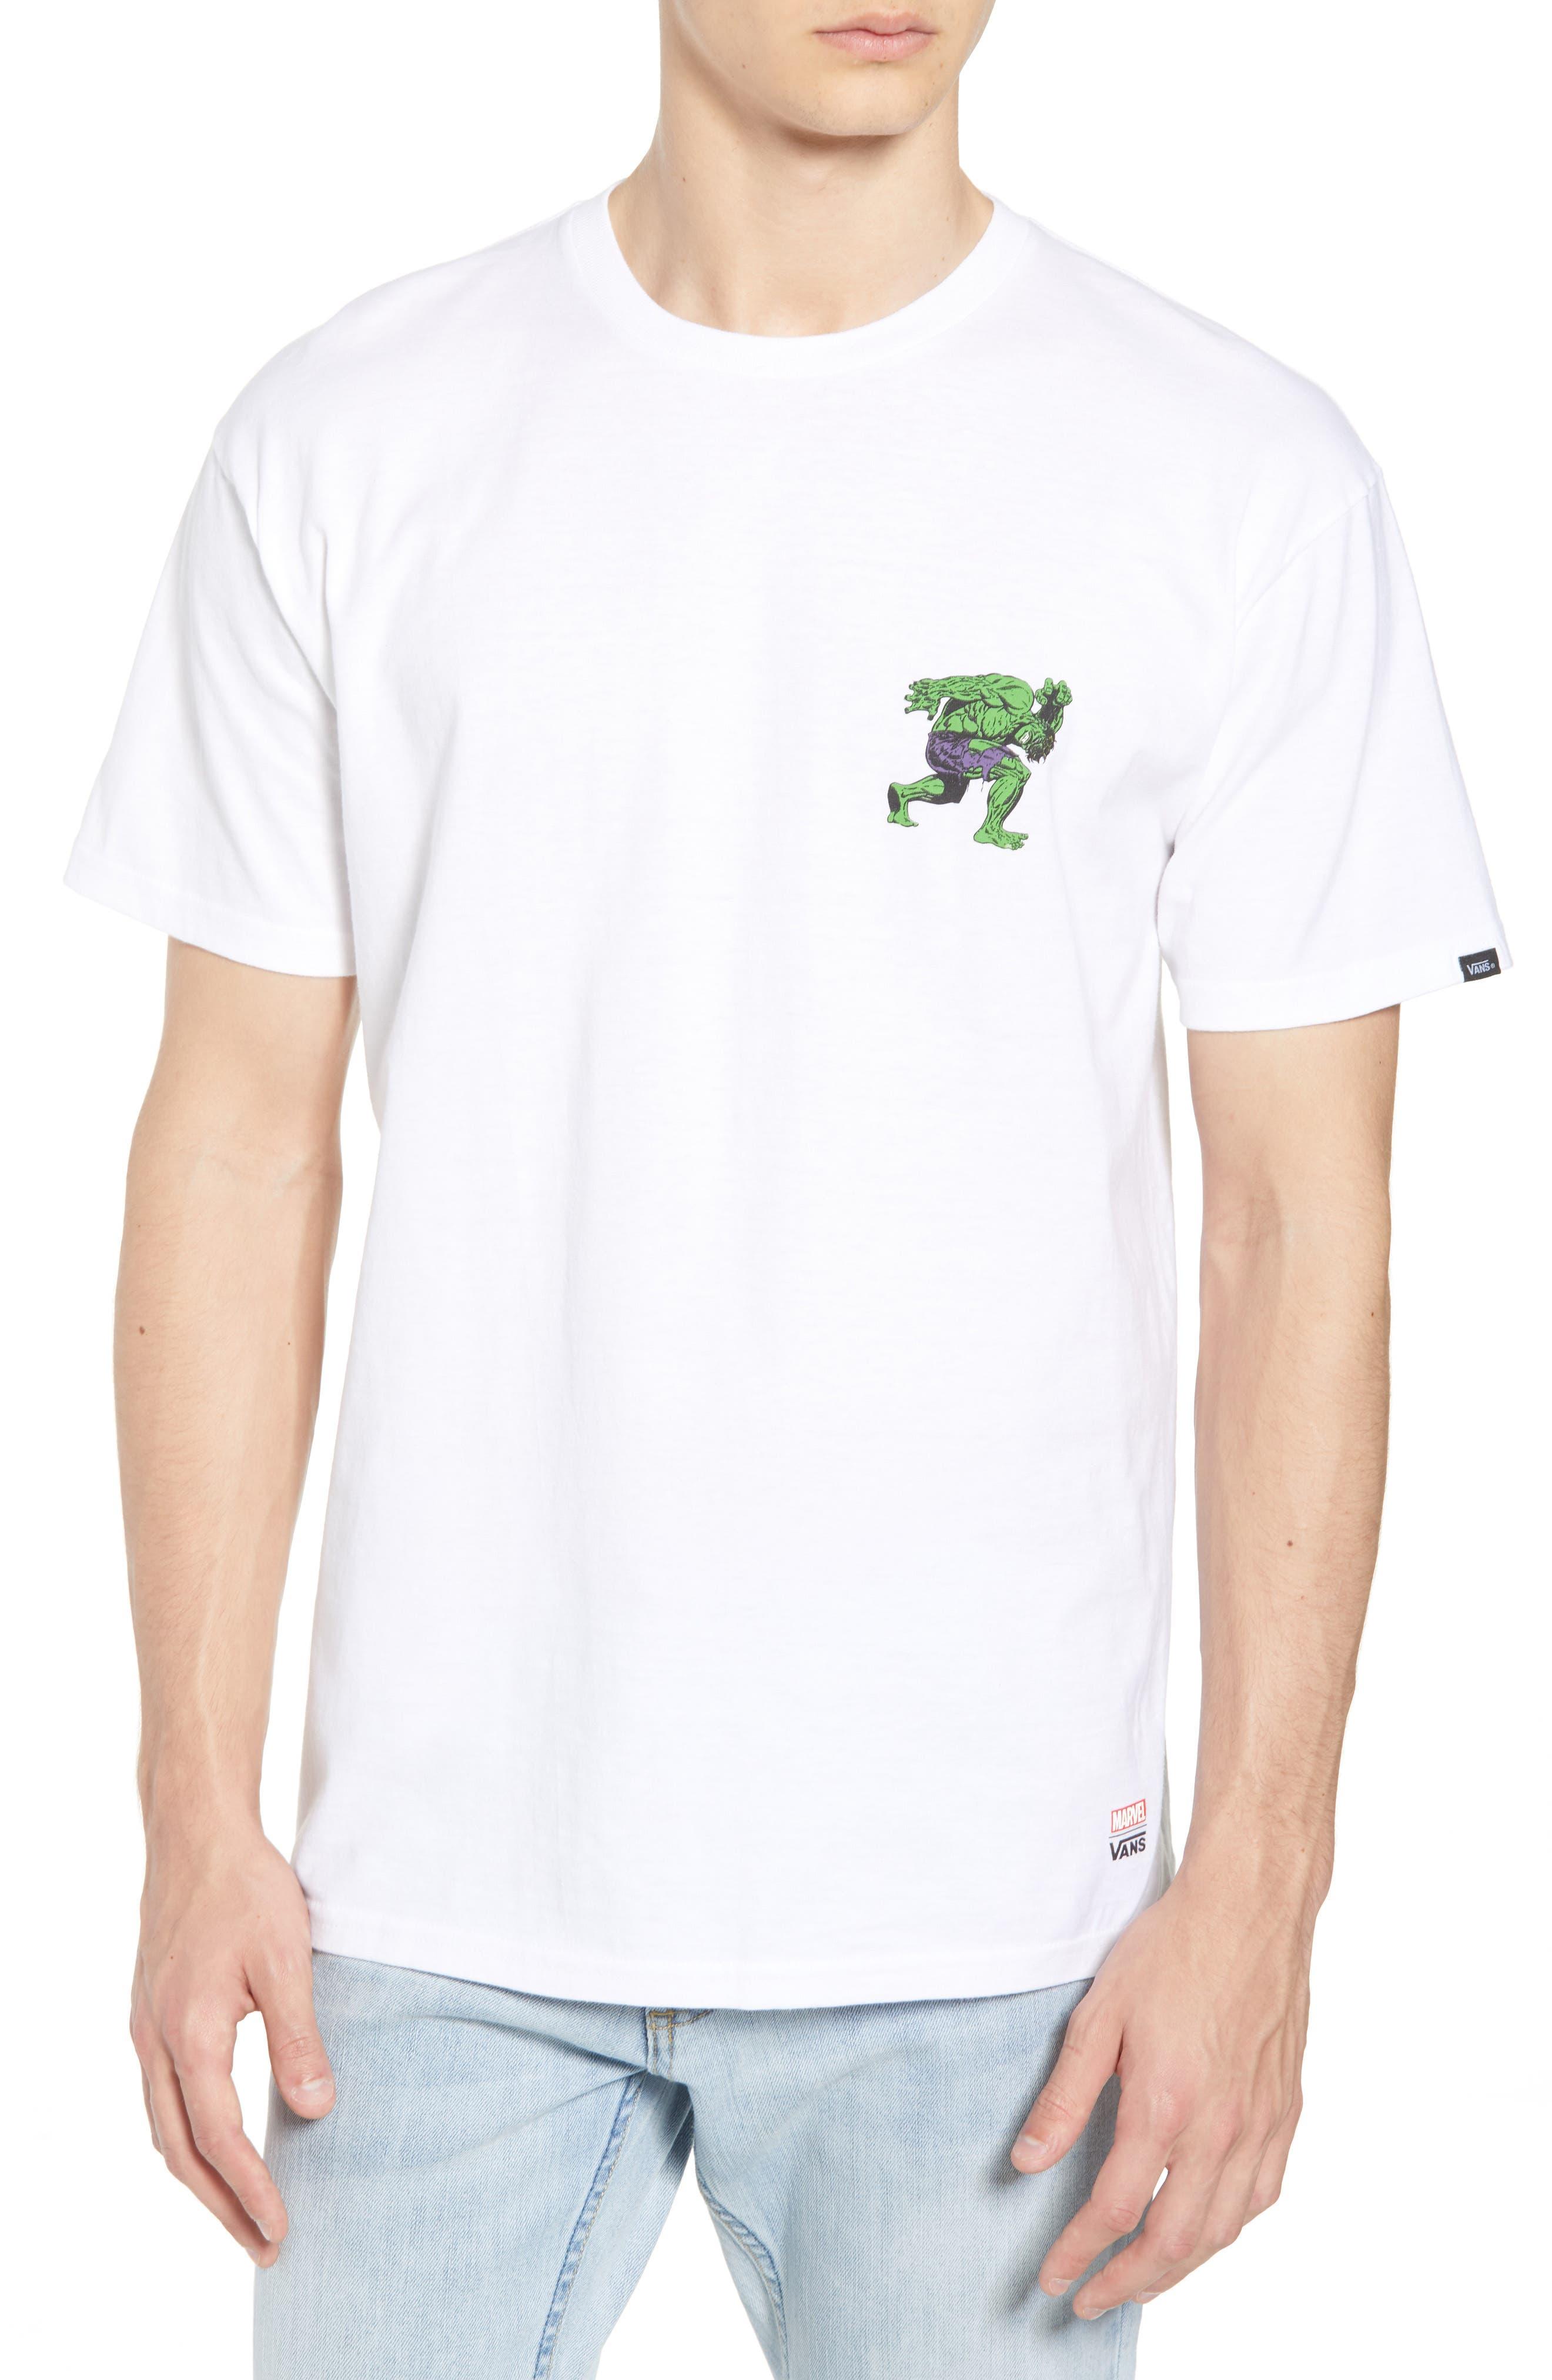 x Marvel<sup>®</sup> Hulk T-Shirt,                             Main thumbnail 1, color,                             WHITE